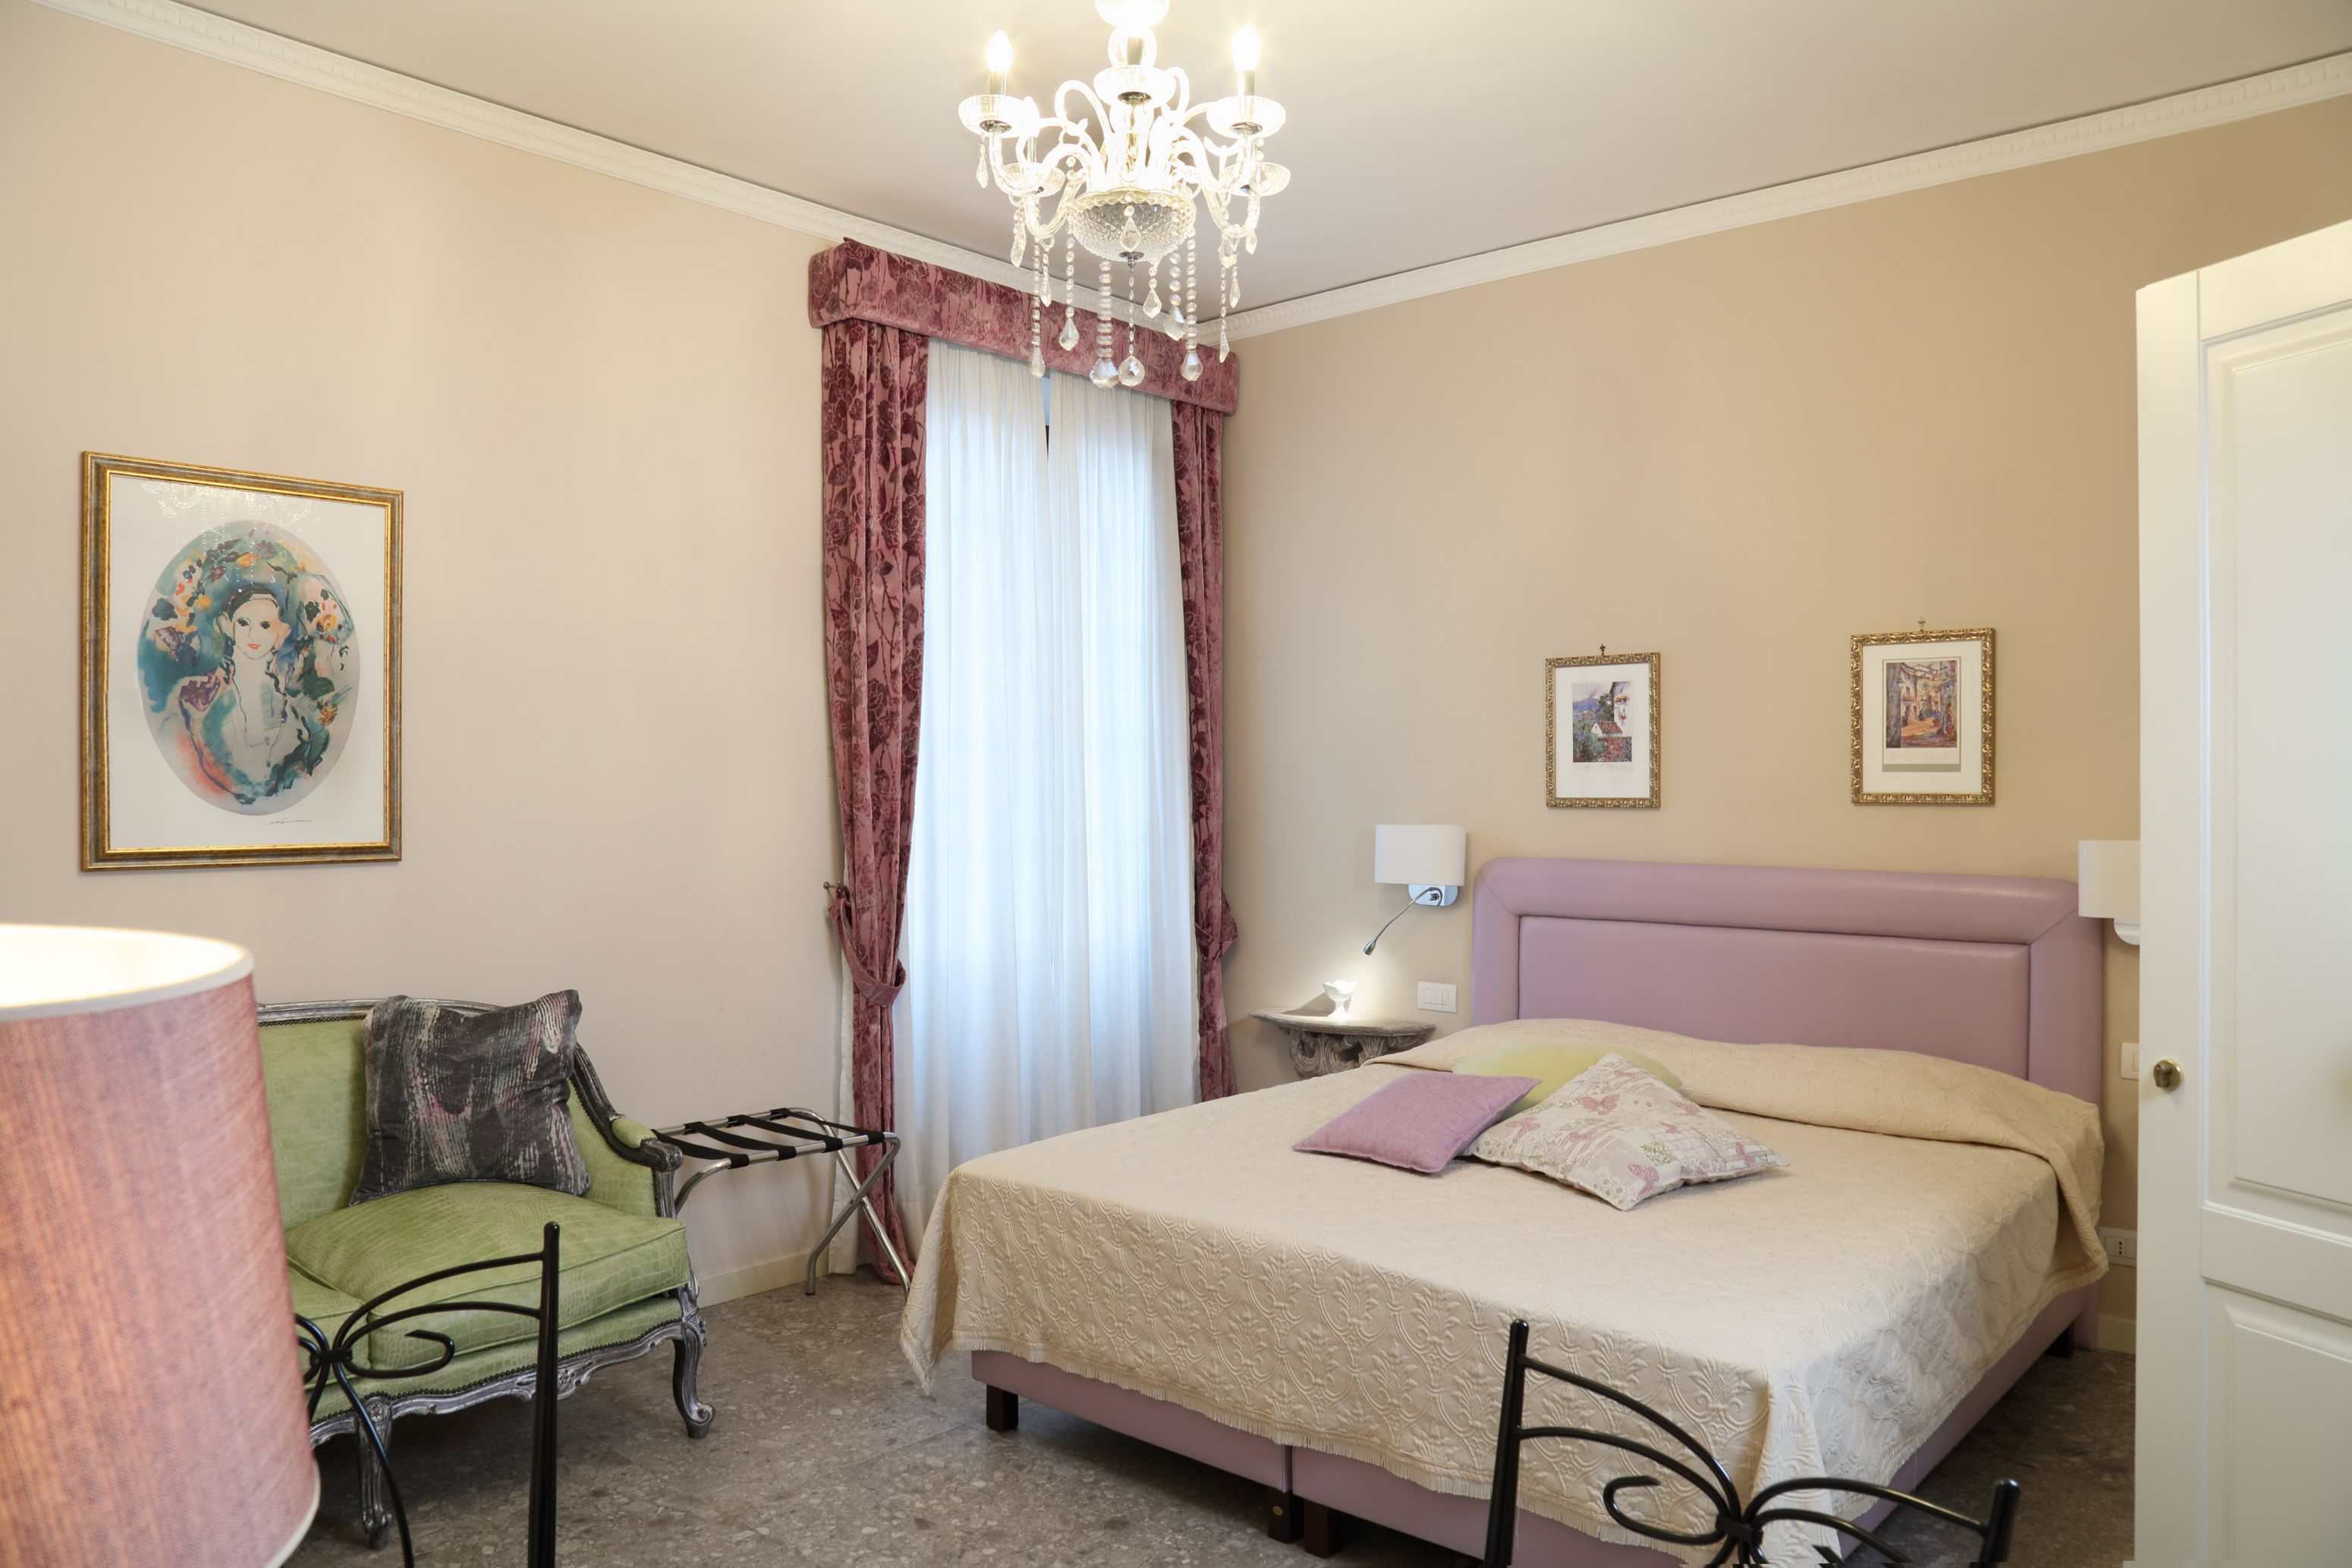 Slide Down 1 Le Mura Suite Room Taormina